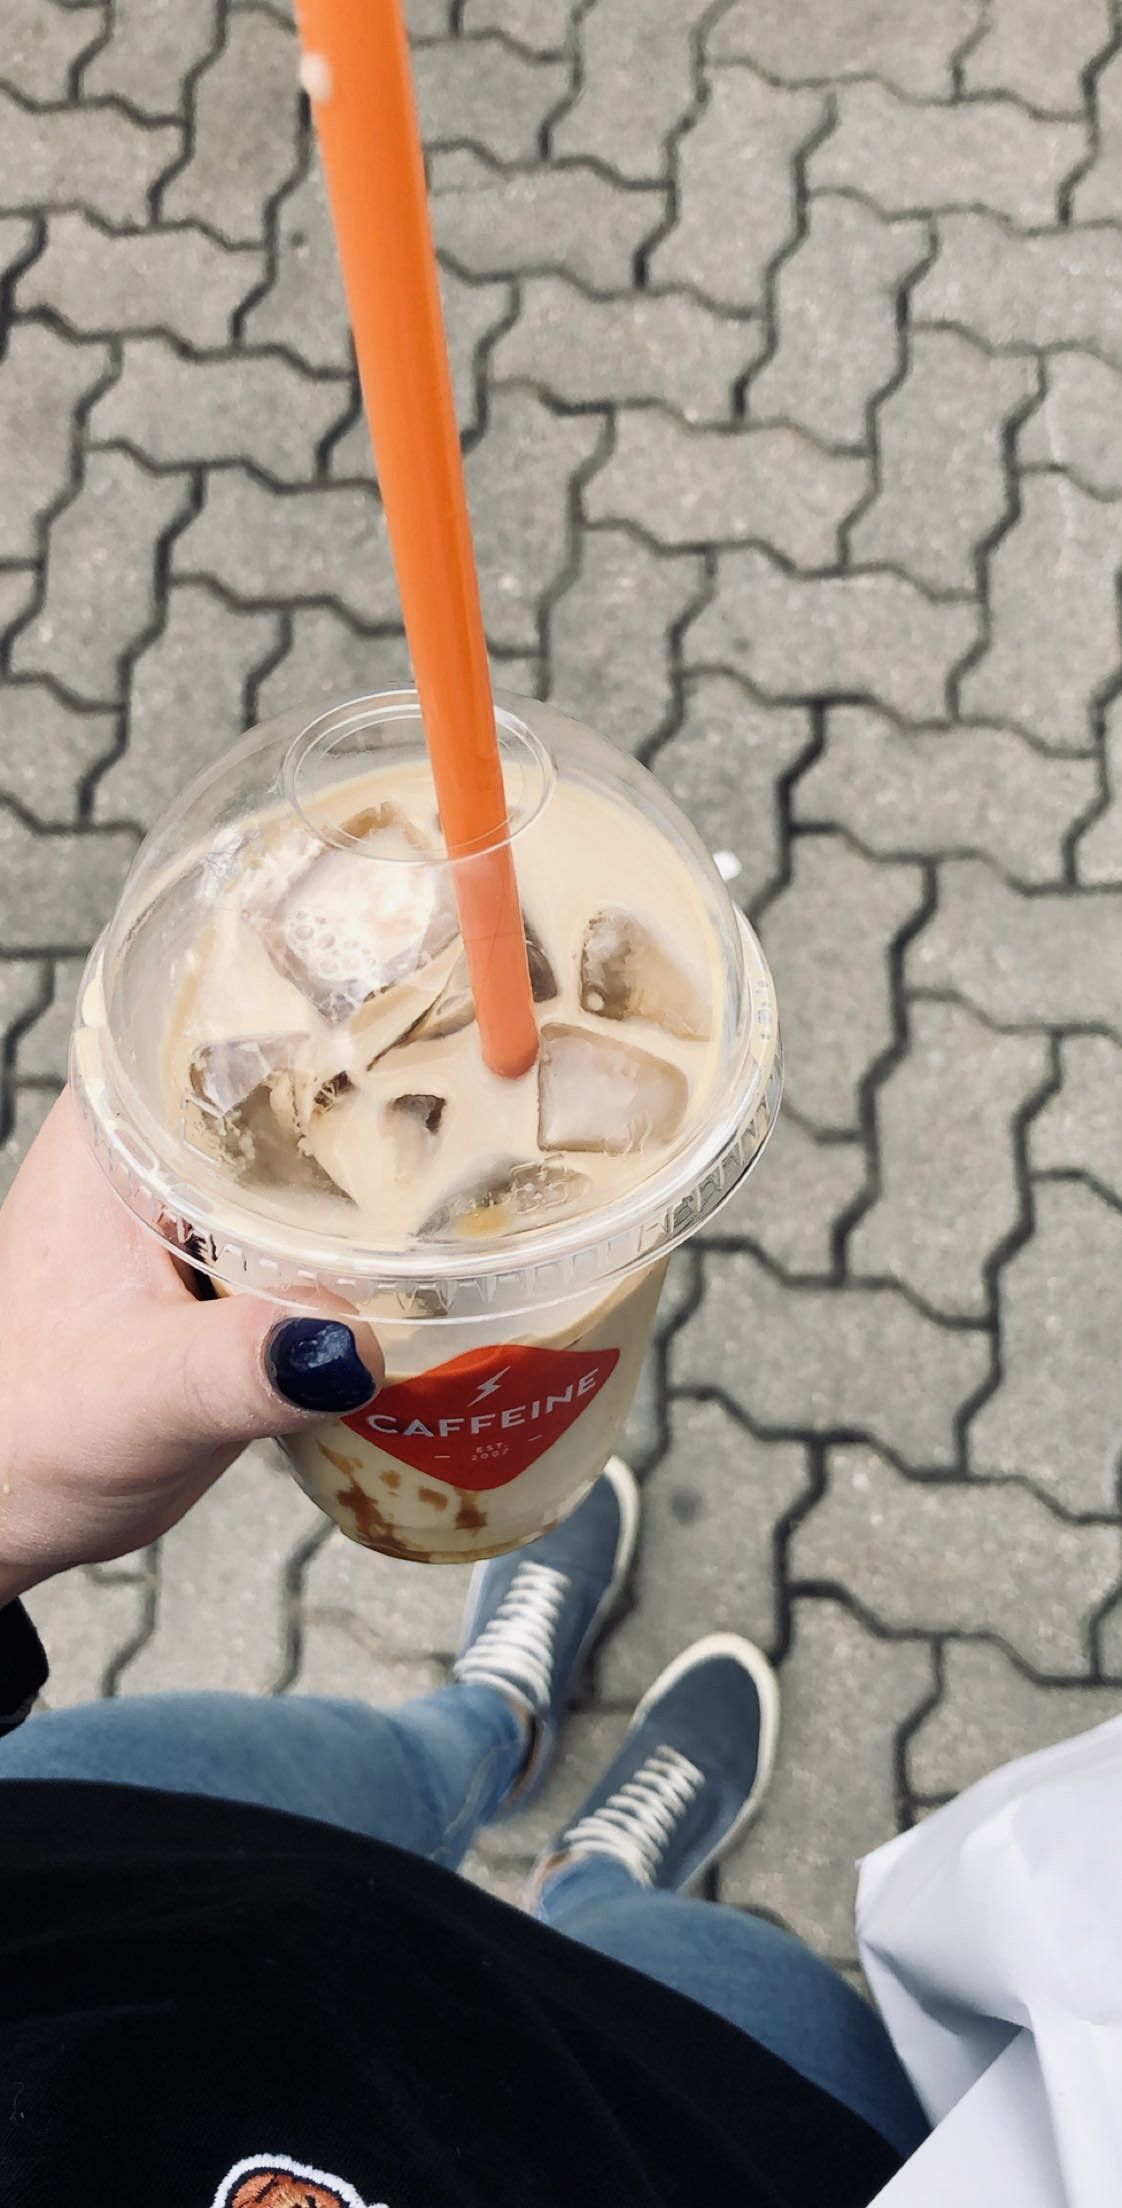 Caffeine ice coffee in 2020 Iced coffee, Ice cream, Caffeine